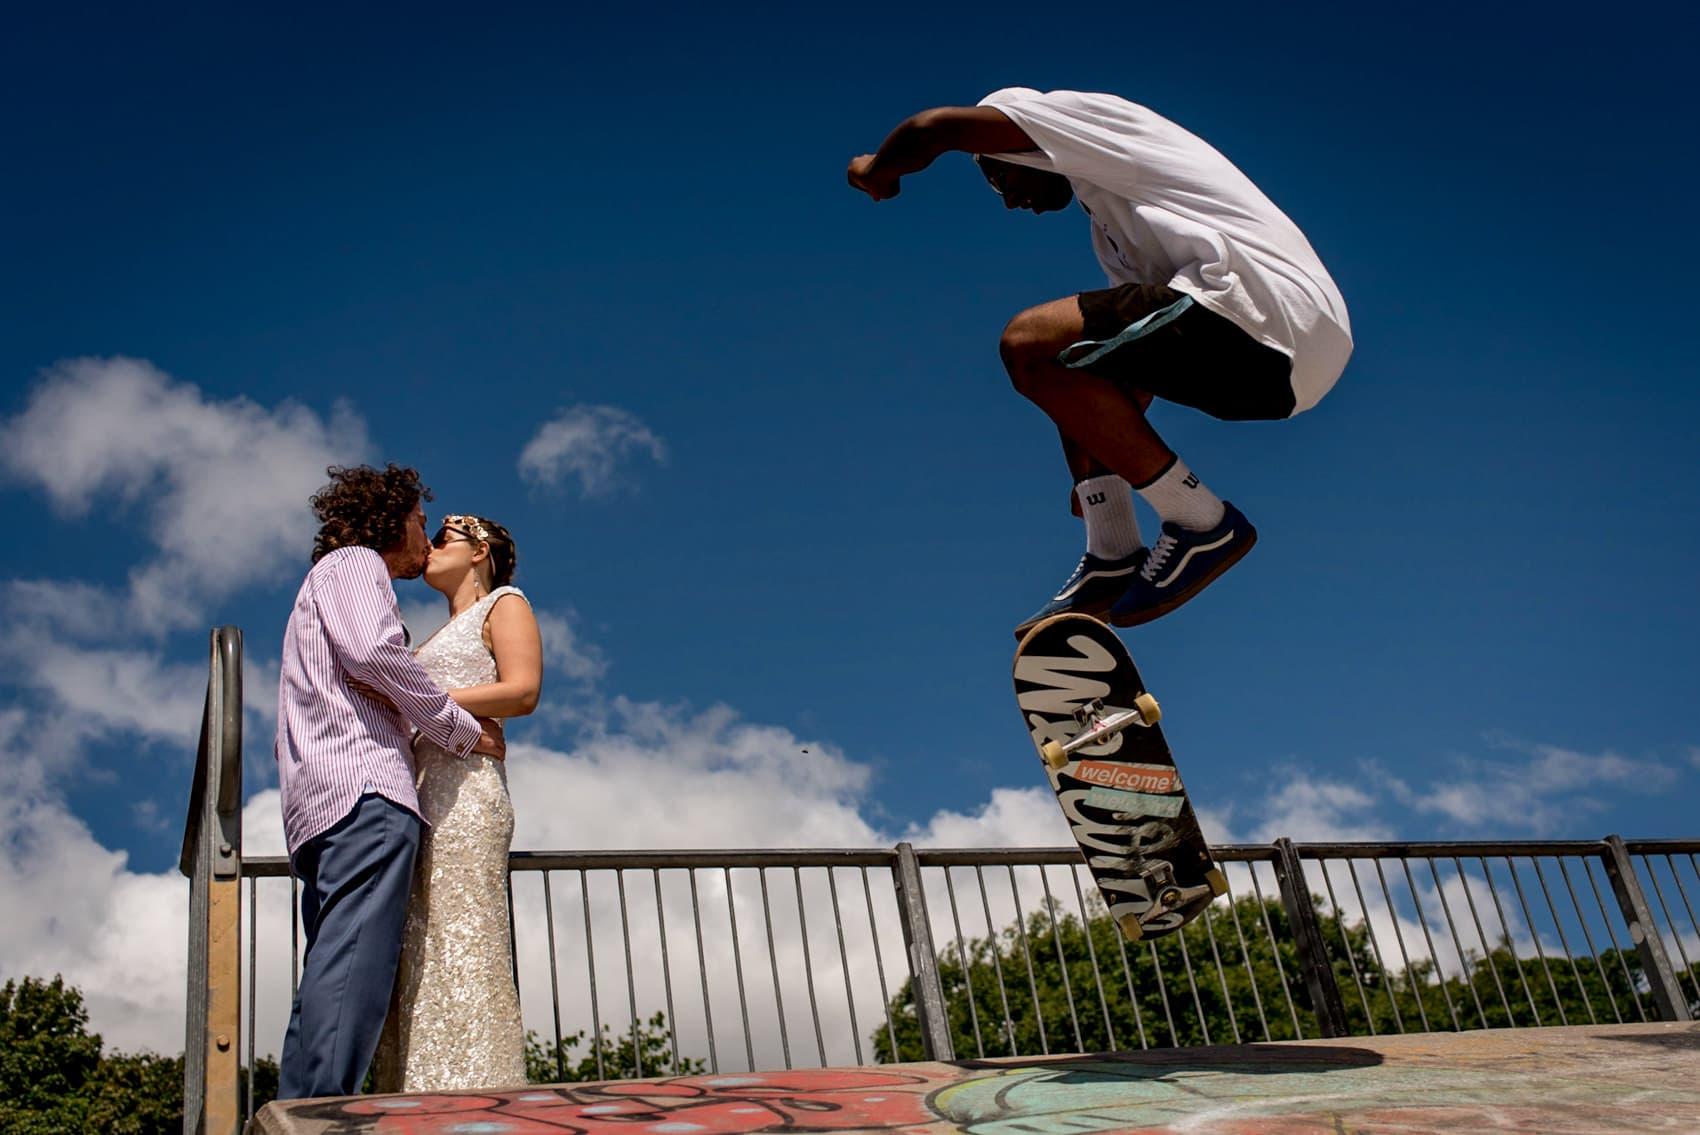 alternative bride and groom skateboarding portrait